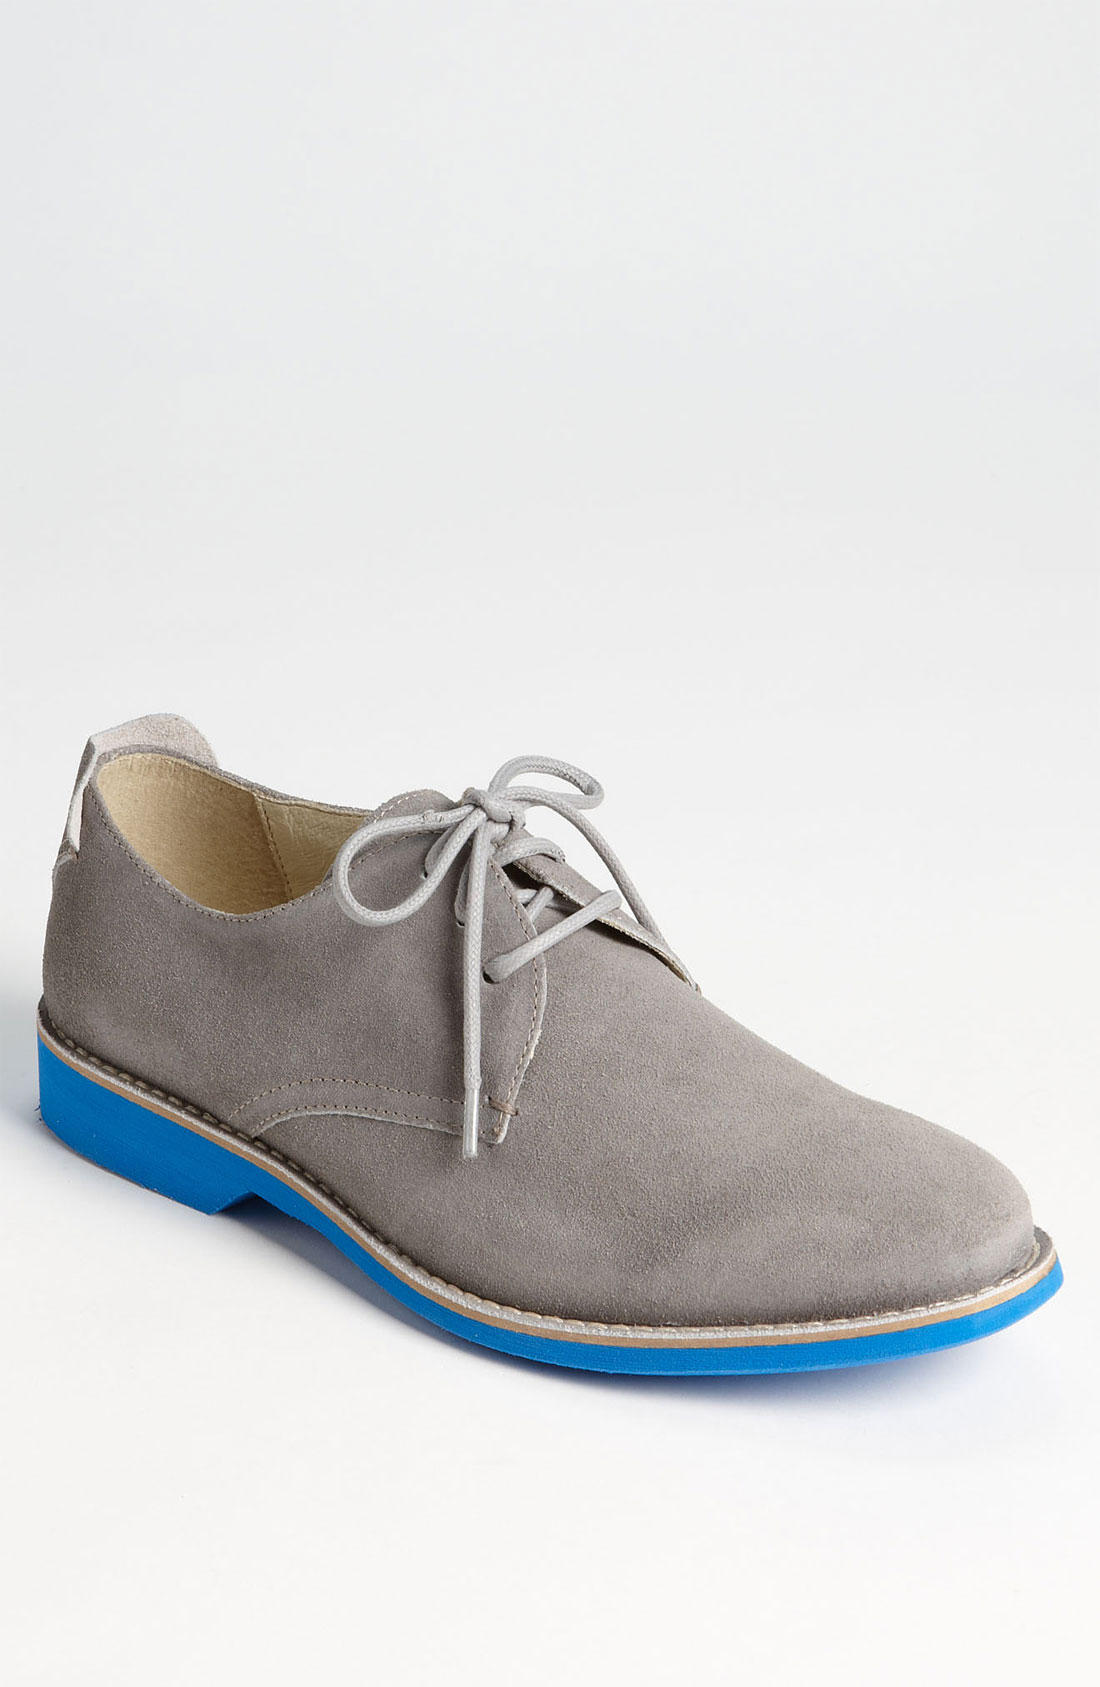 Bucks Shoe Store